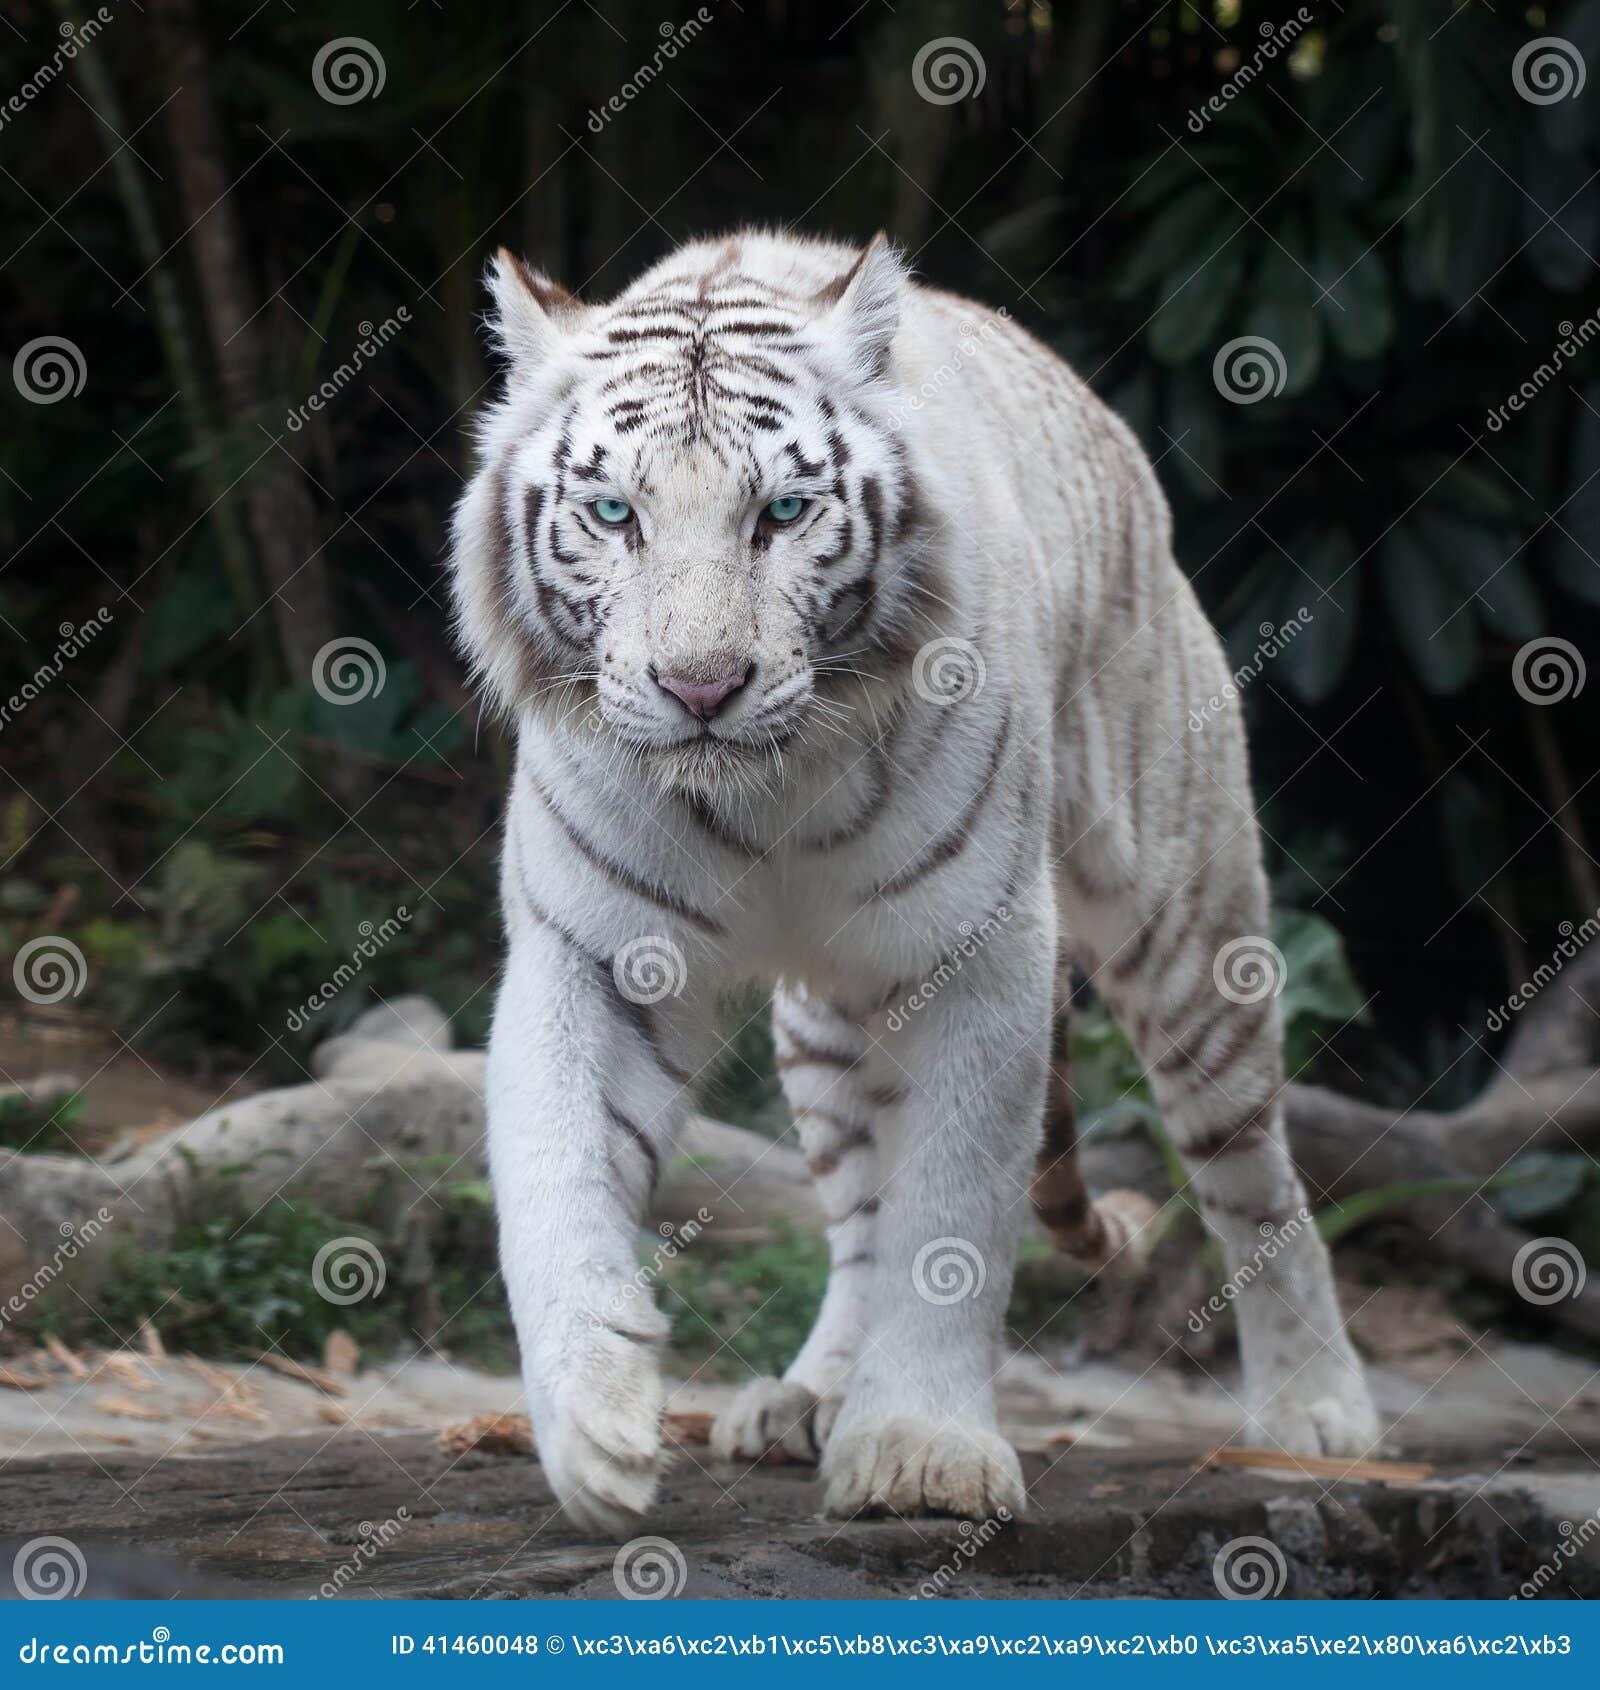 Funny Cat Videos For Kids Tigar